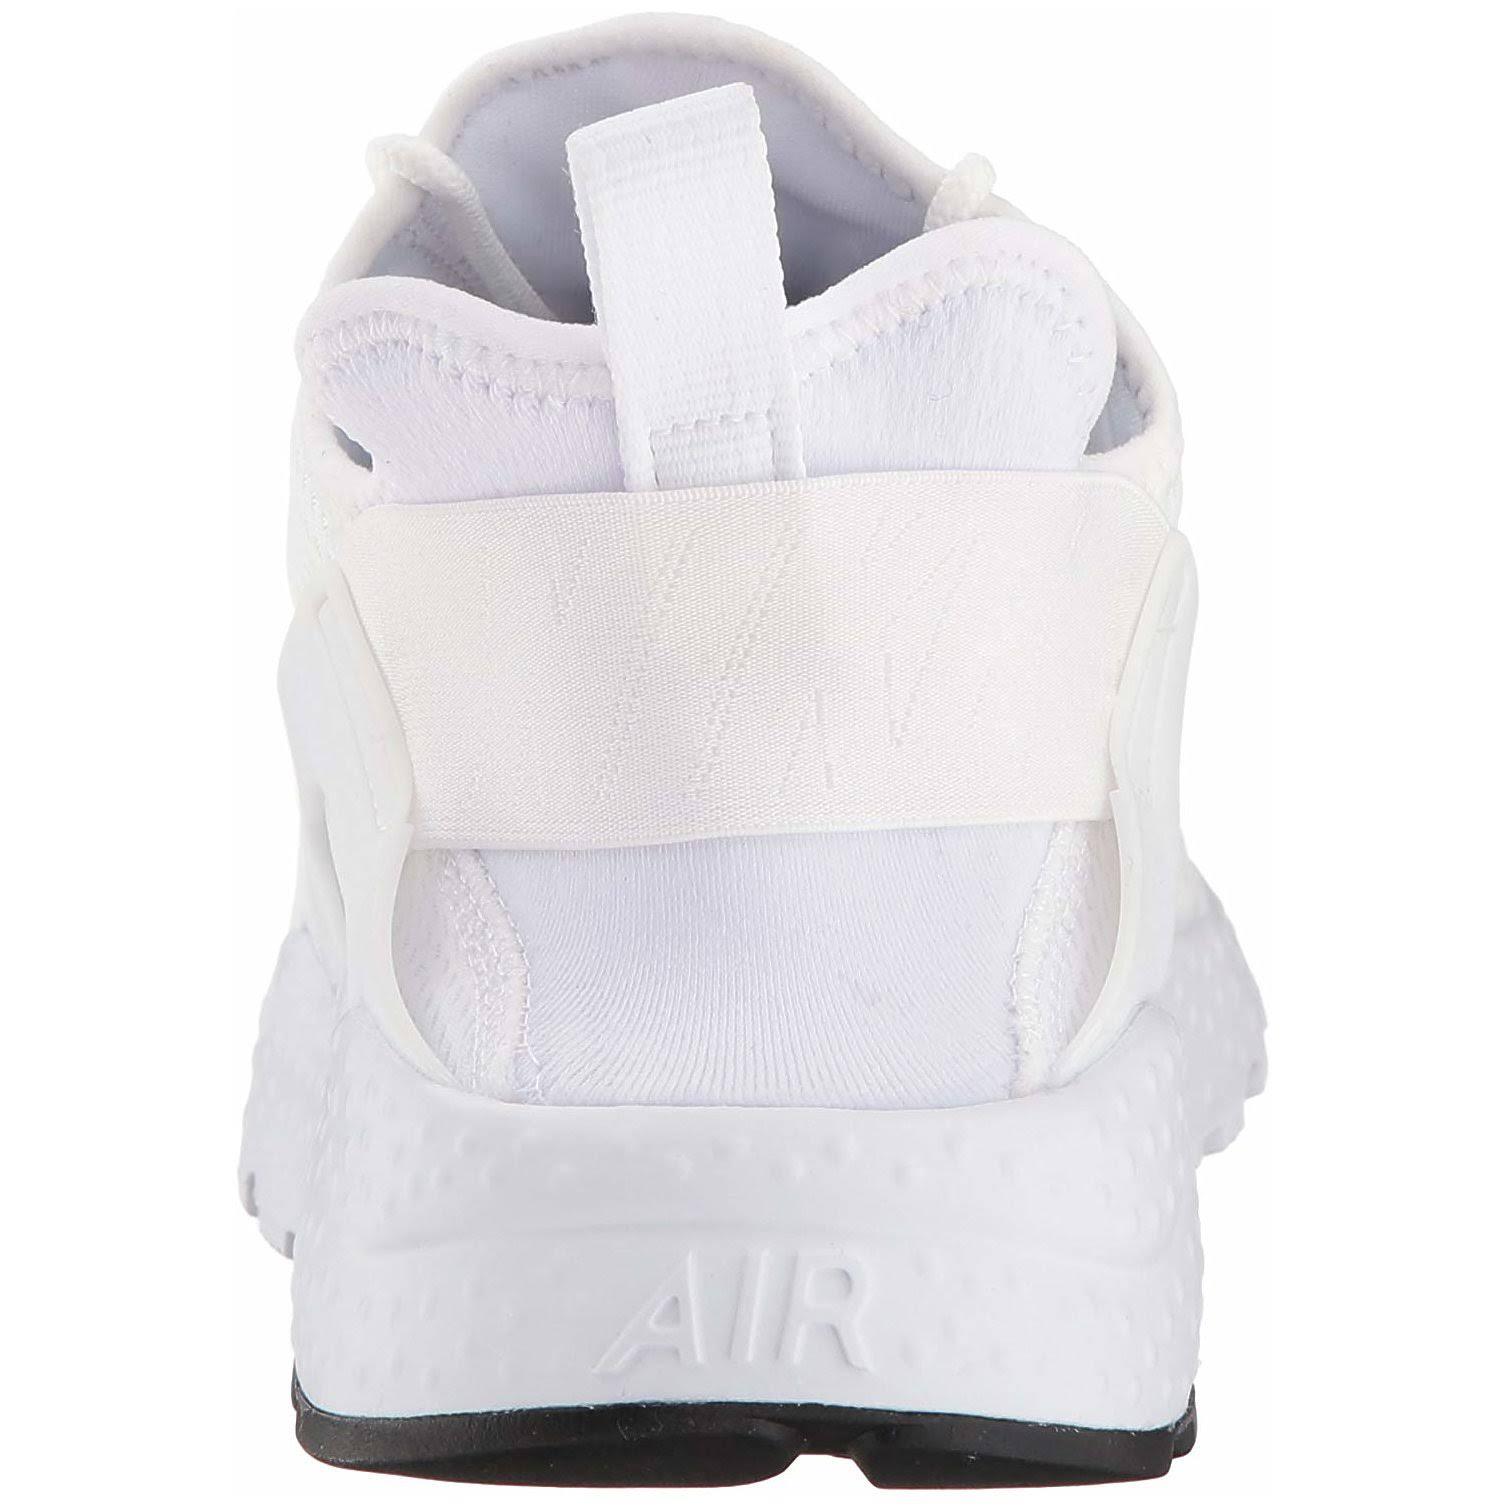 Run Ultra Negro Air Para Huarache 10b Nike Mujer Running Zapatillas De Tamaño xnwY1qPX6R